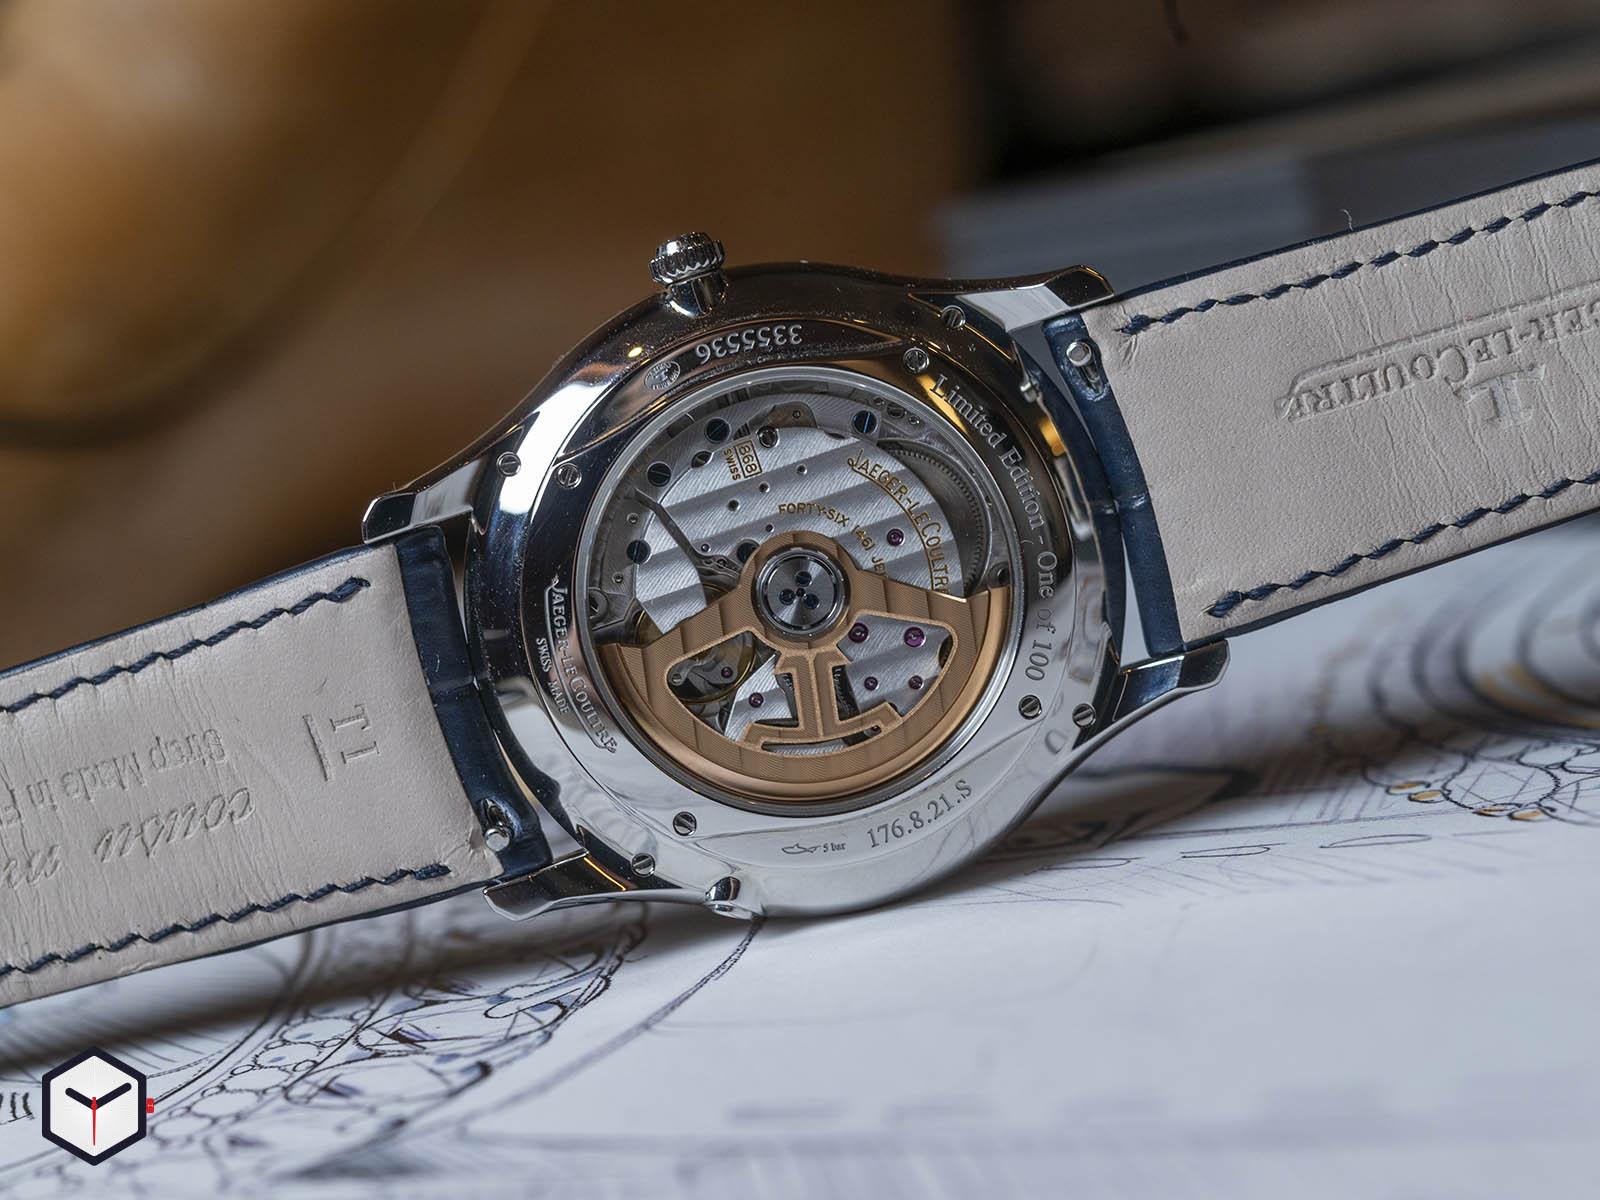 q13035e1-jaeger-lecoultre-master-ultra-thin-perpetual-enamel-limited-edition-4.jpg